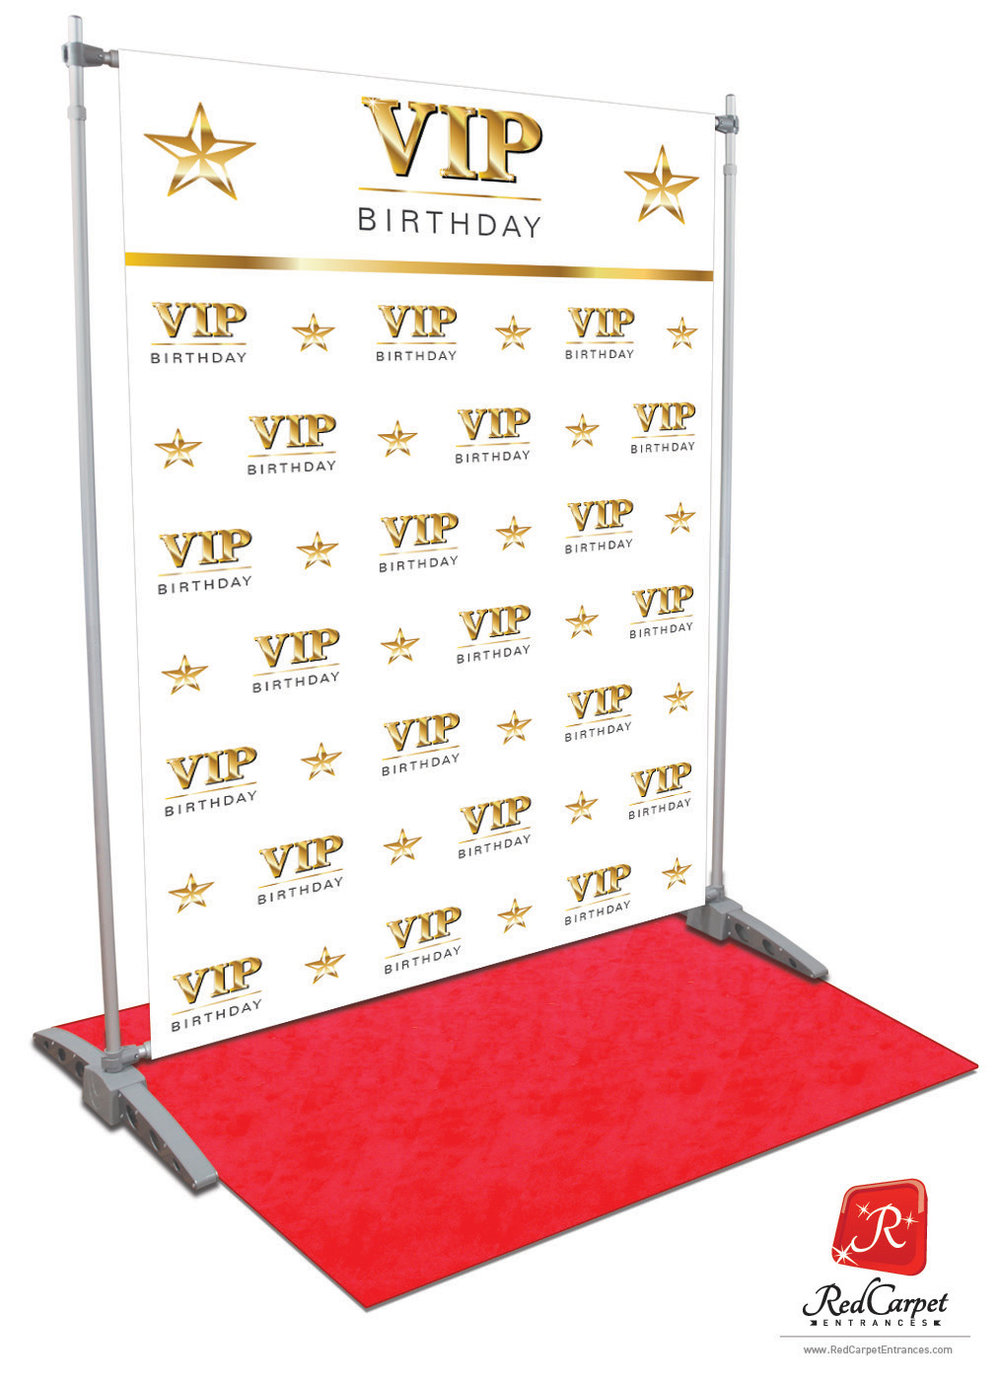 Vip Birthday Backdrop Red Carpet Kit White 5x8 Red